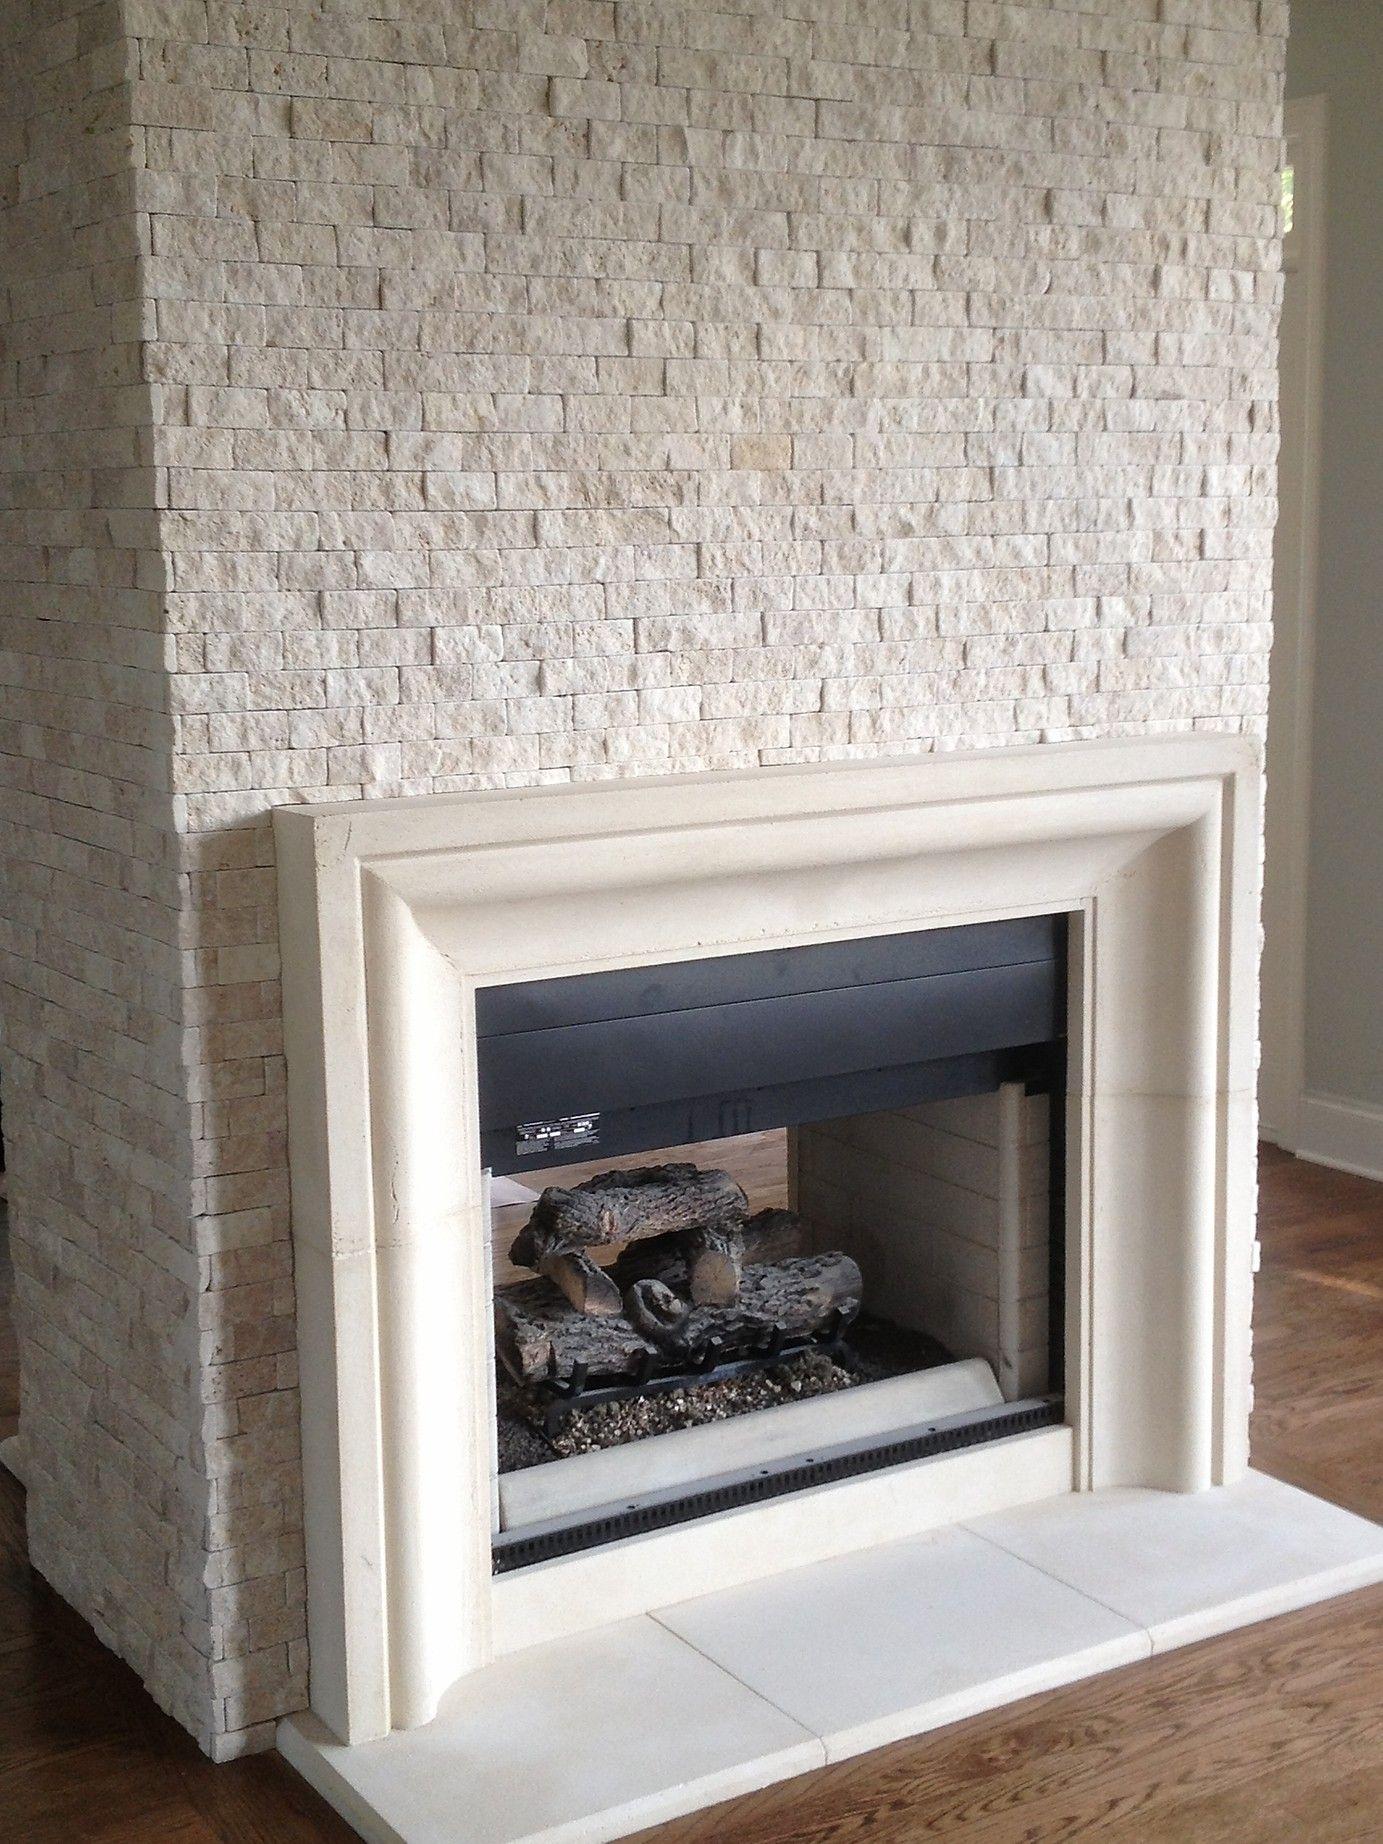 Cast stone fireplace limestone mantel surround precast